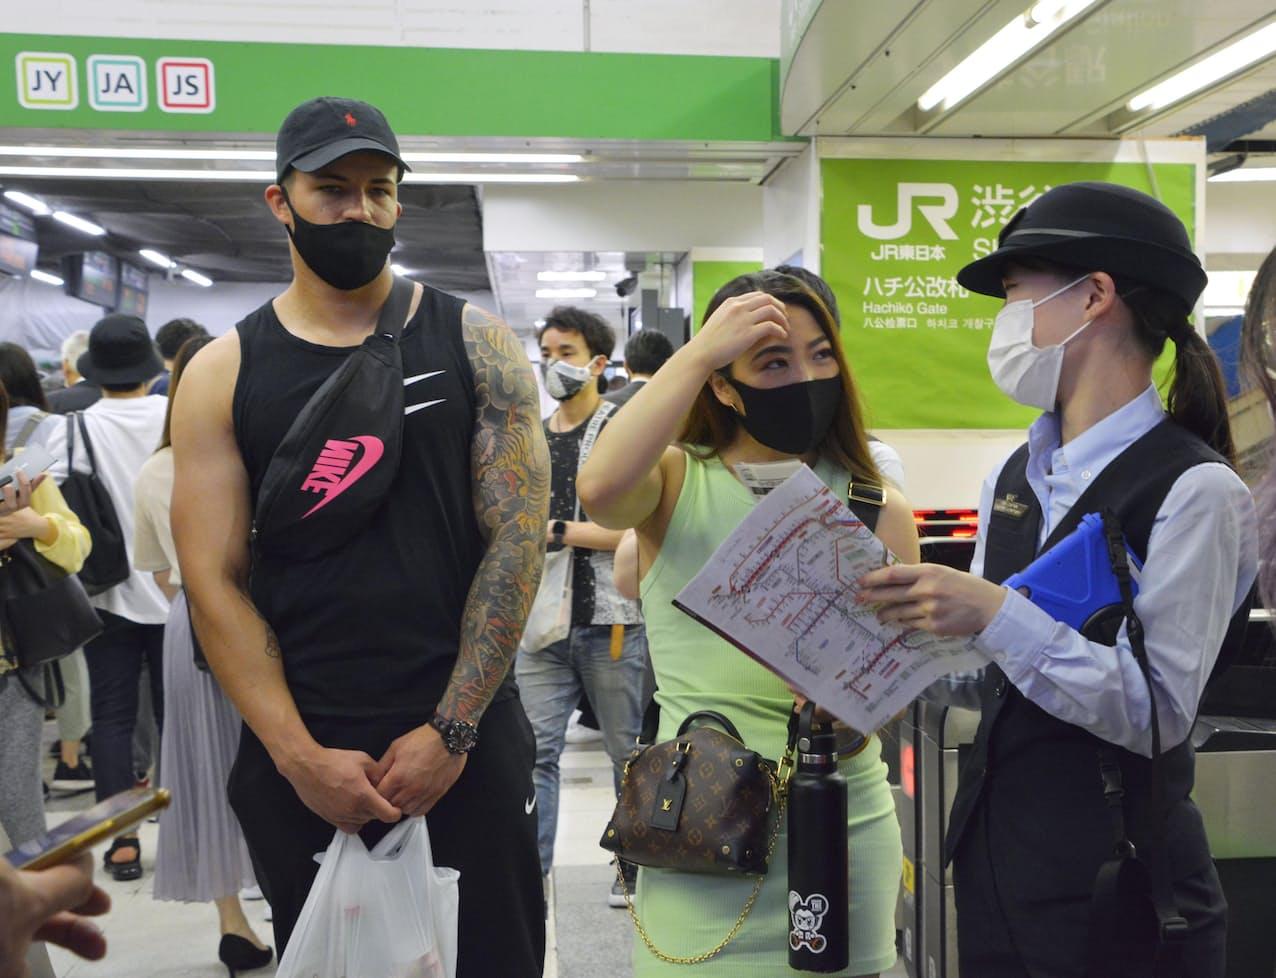 JR渋谷駅で利用客に対応する駅員(20日午後)=共同